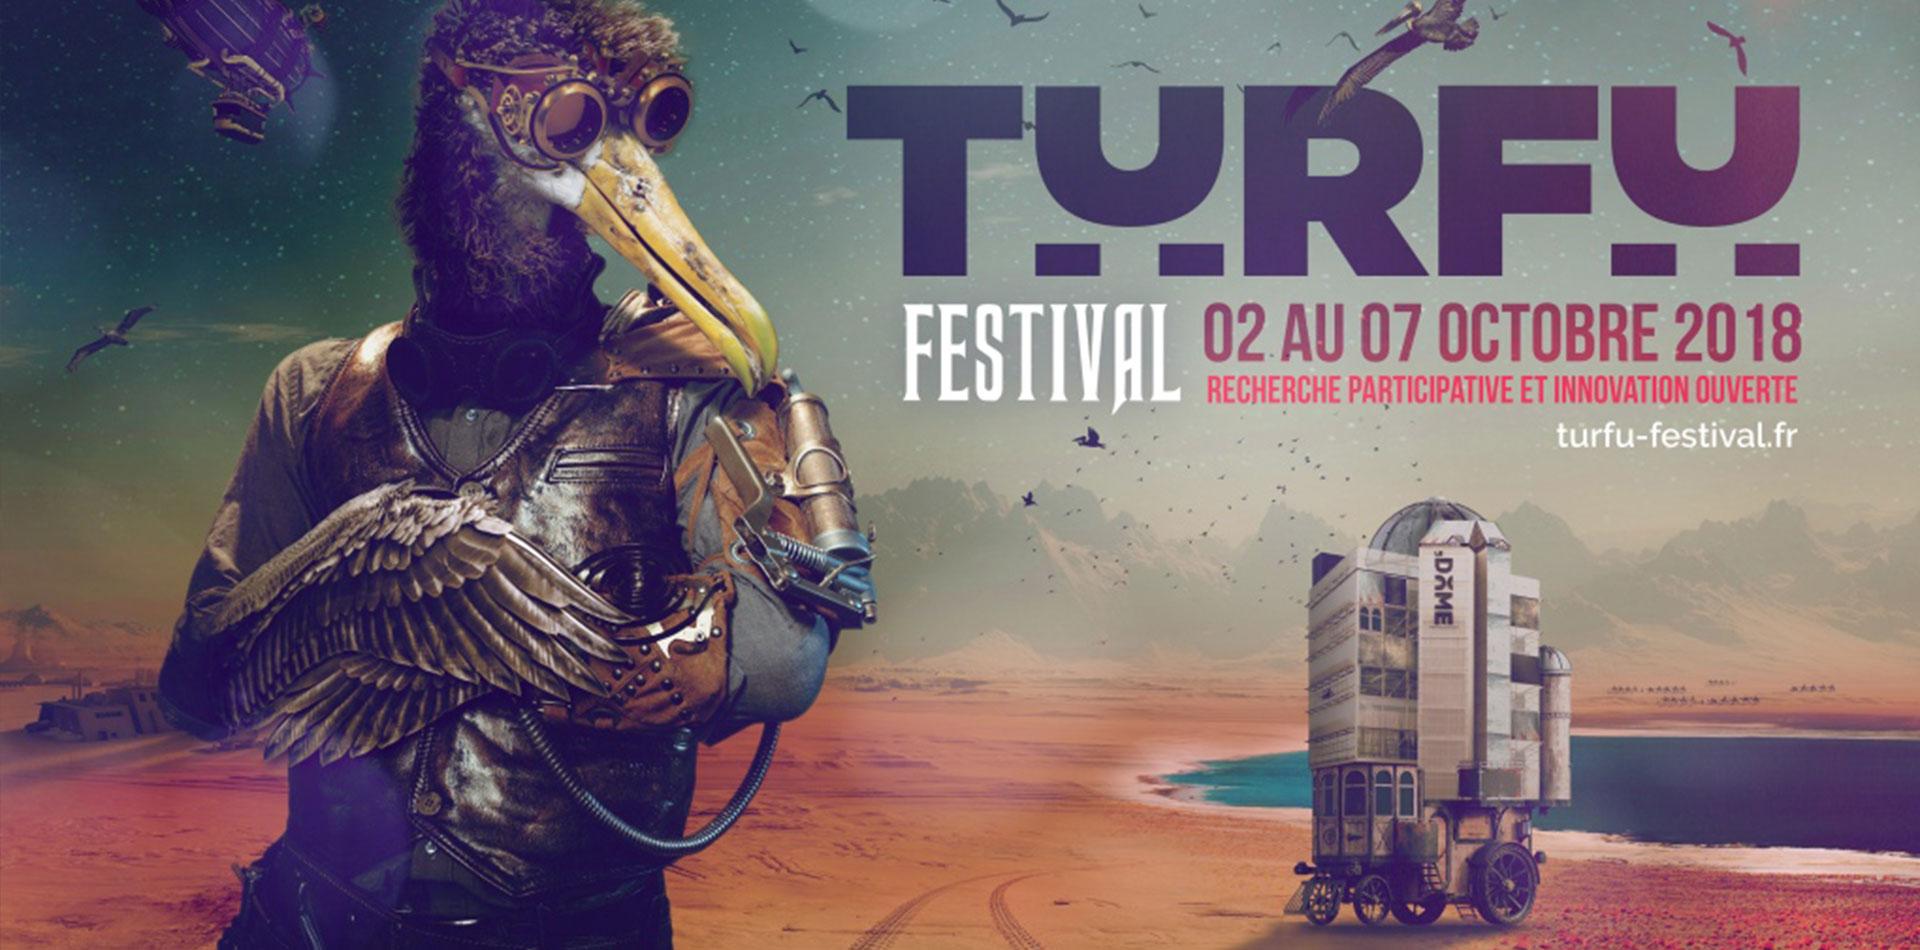 Le TURFU Festival : Imaginer ensemble le futur de demain